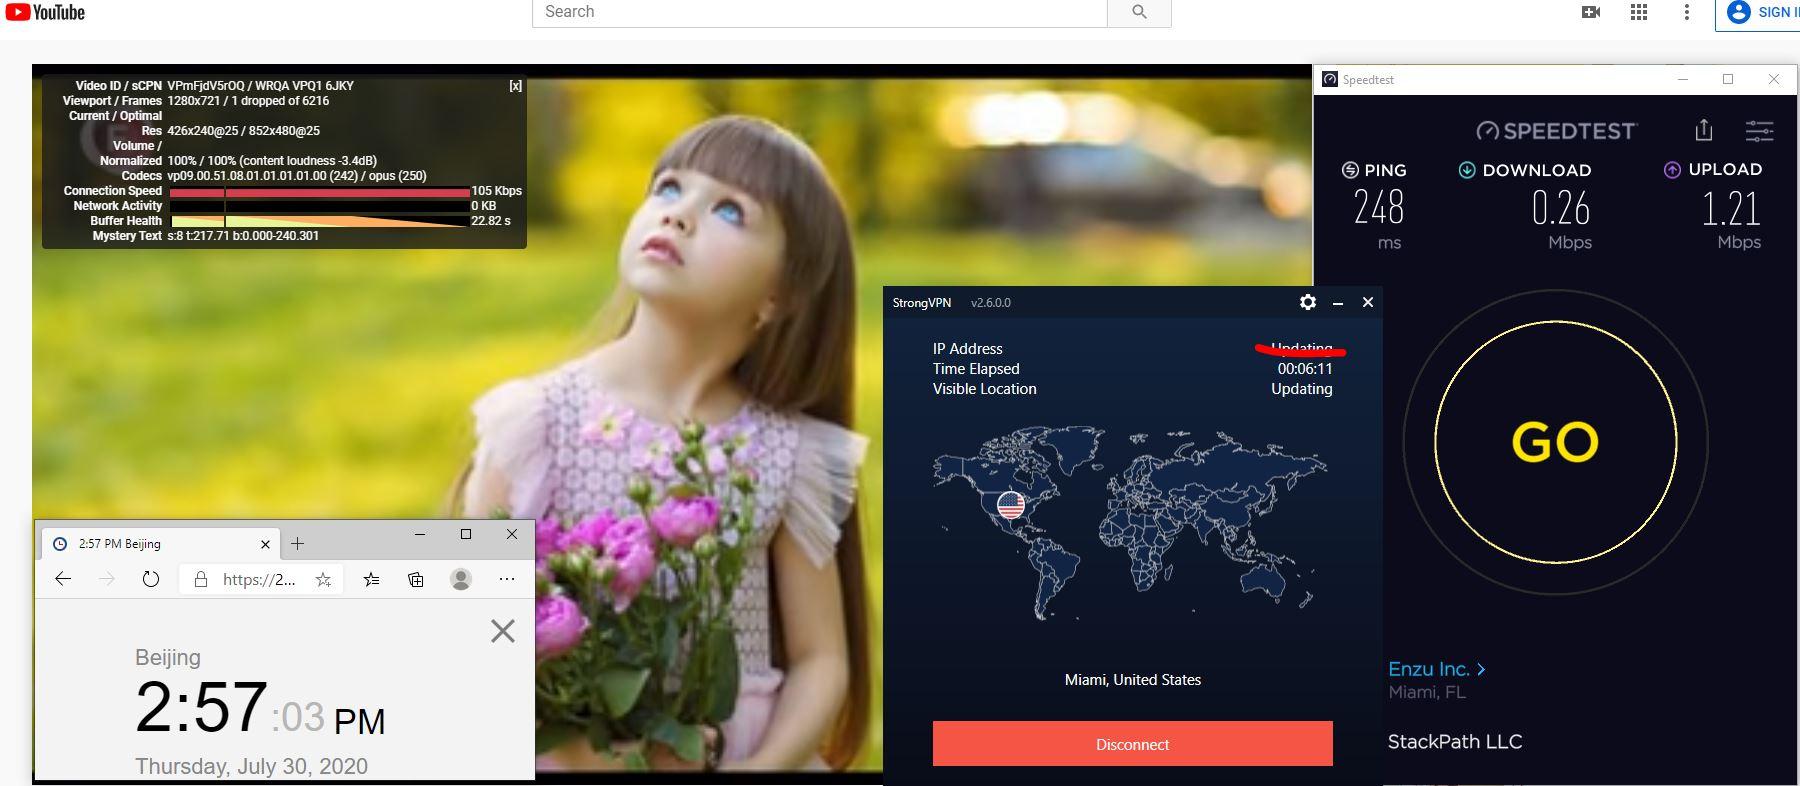 Windows10 StrongVPN USA - Miami 中国VPN 翻墙 科学上网 翻墙速度测试 - 20200730